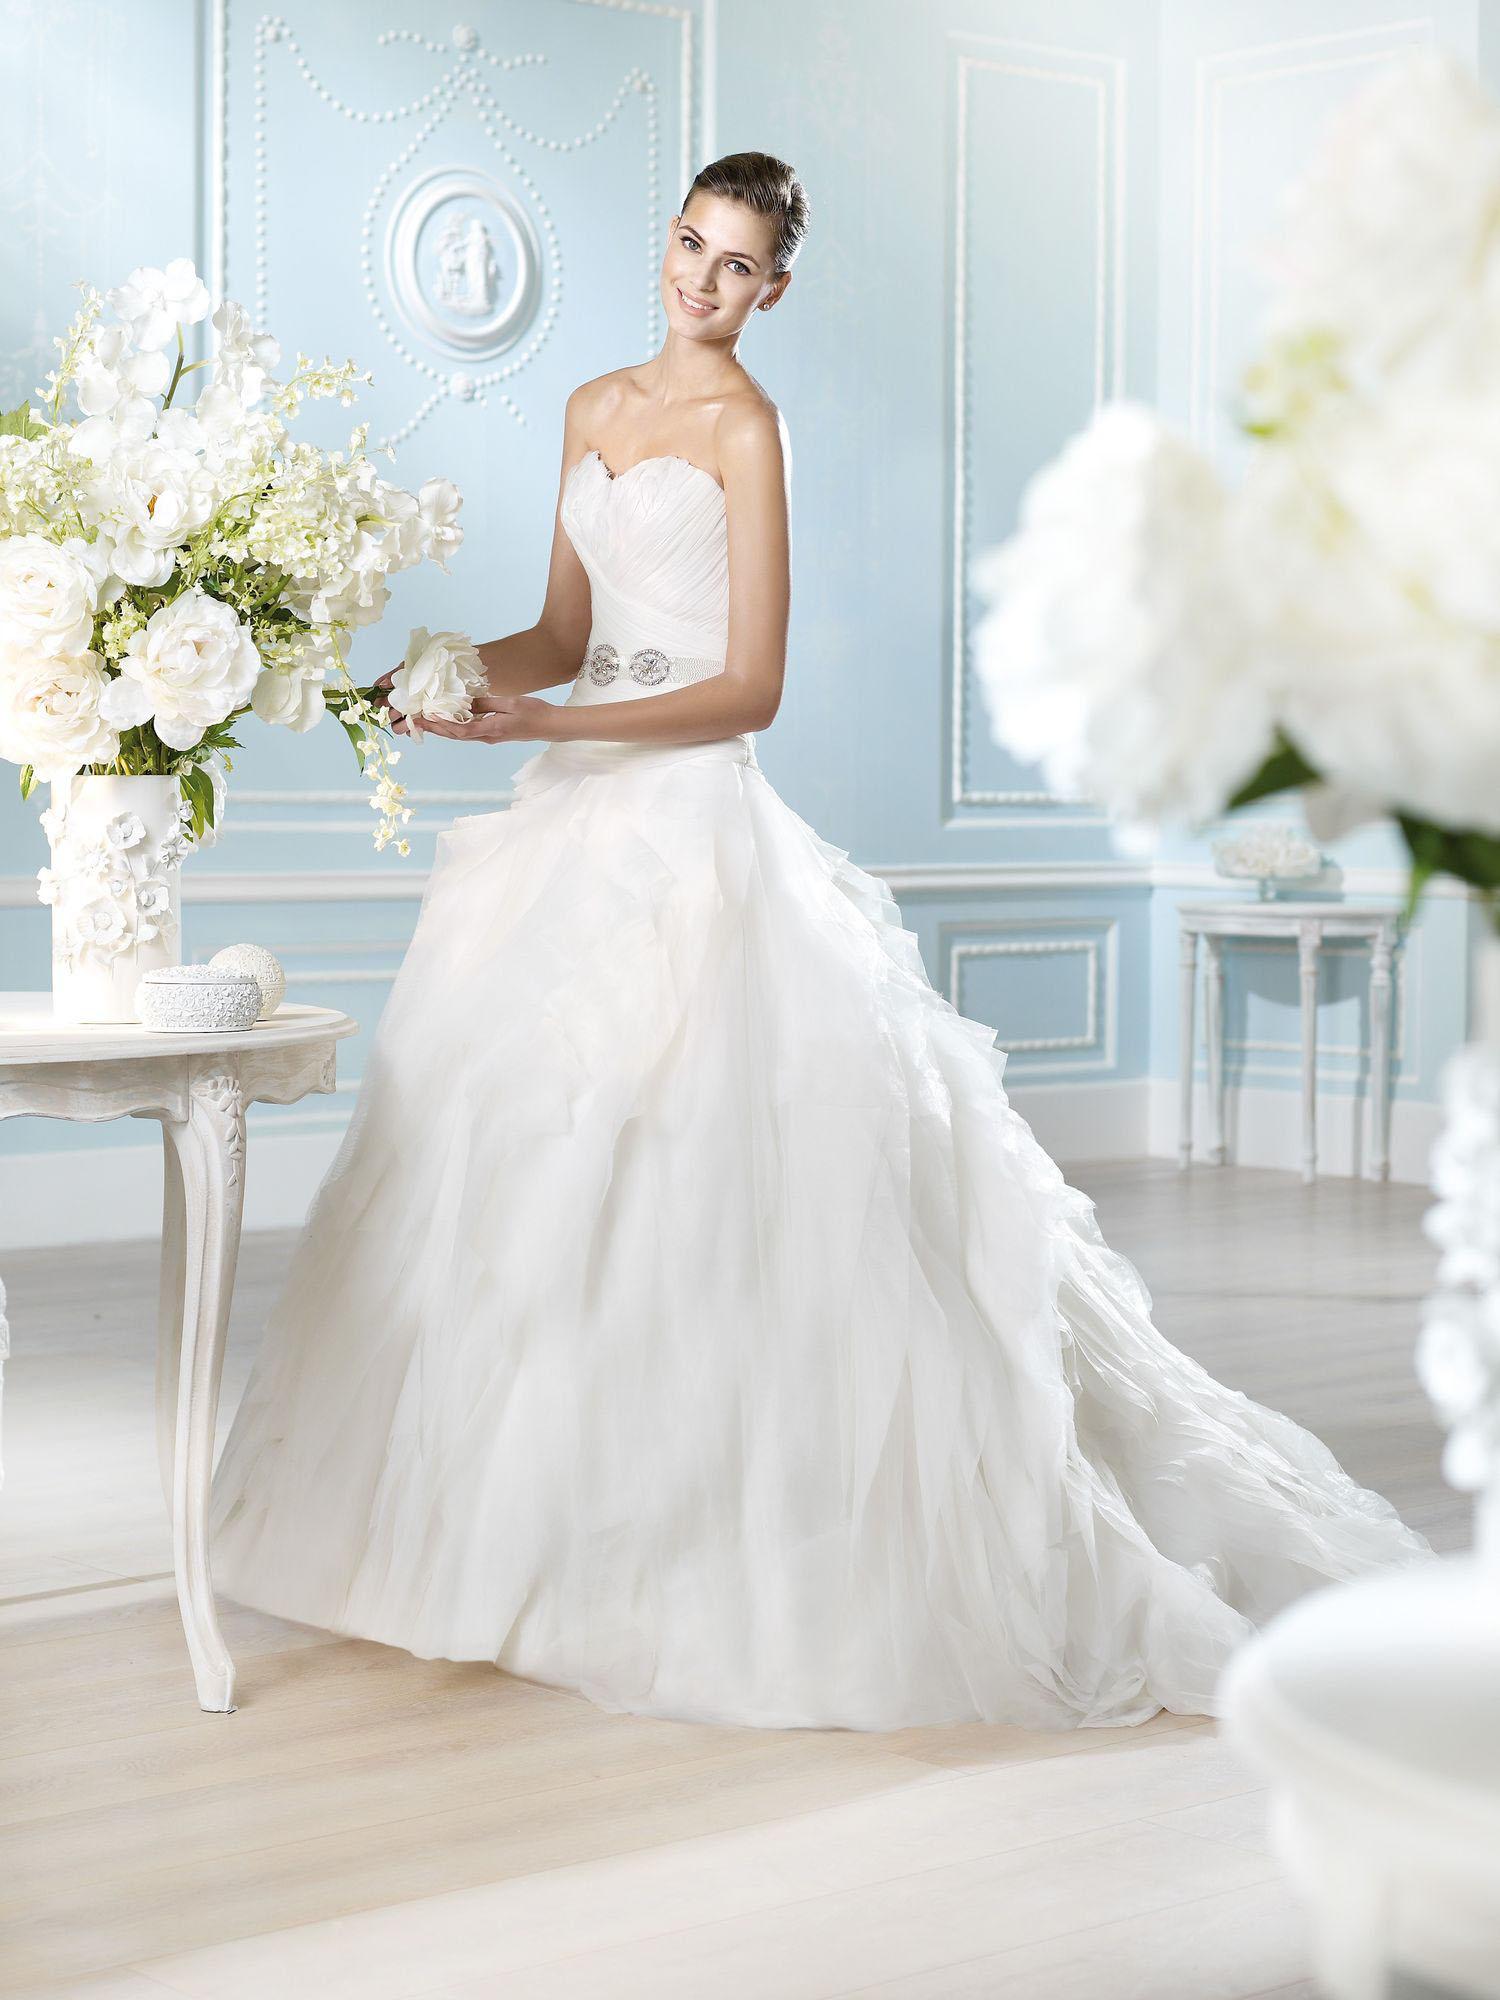 ROBE de mariée AROSA SAN PATRICK soniab marseille proche toulon 83